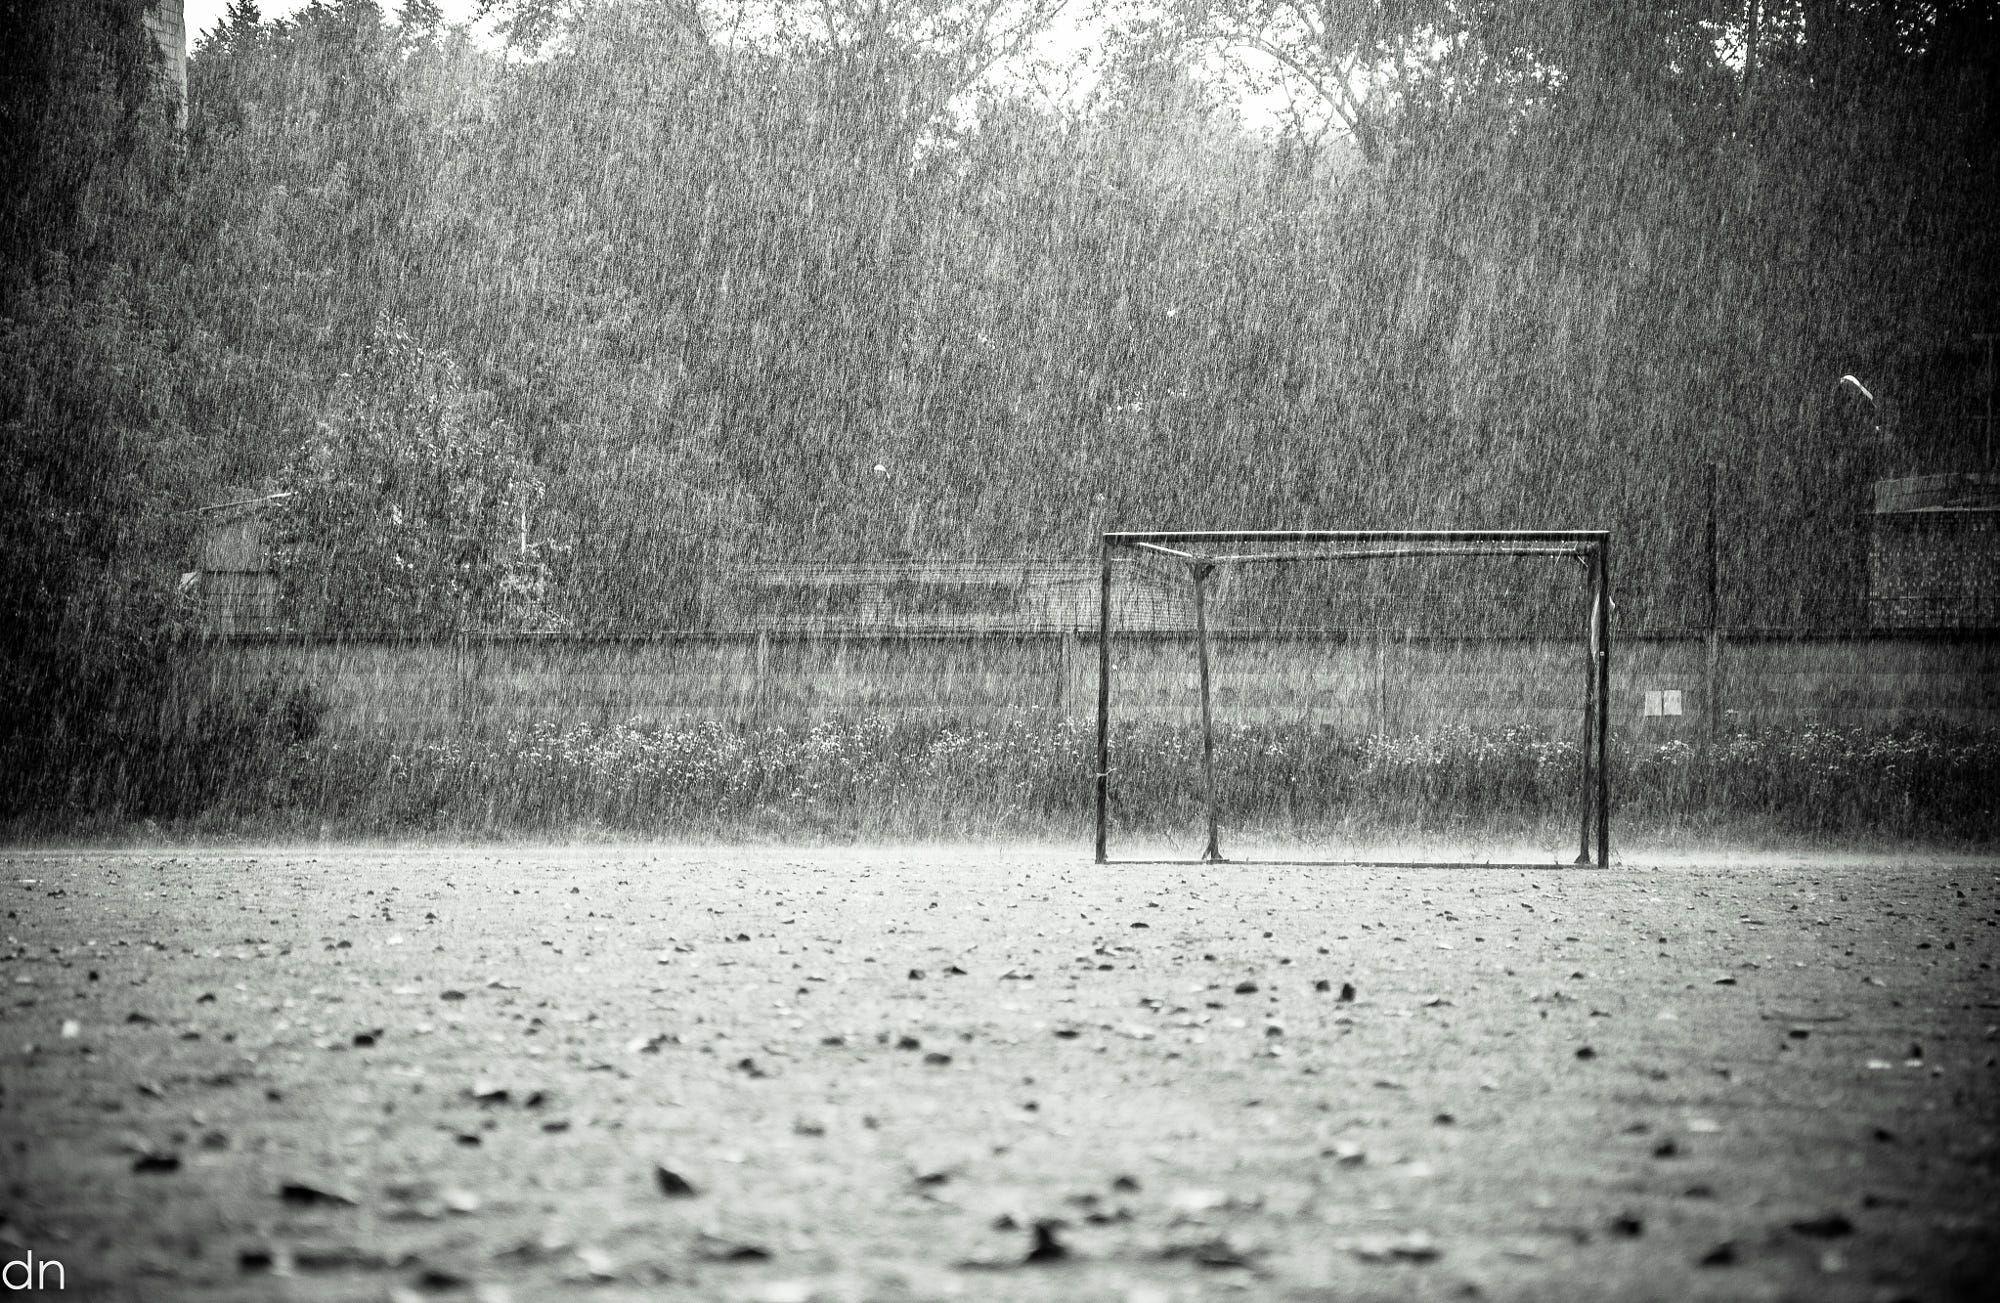 Rain On The Football Field